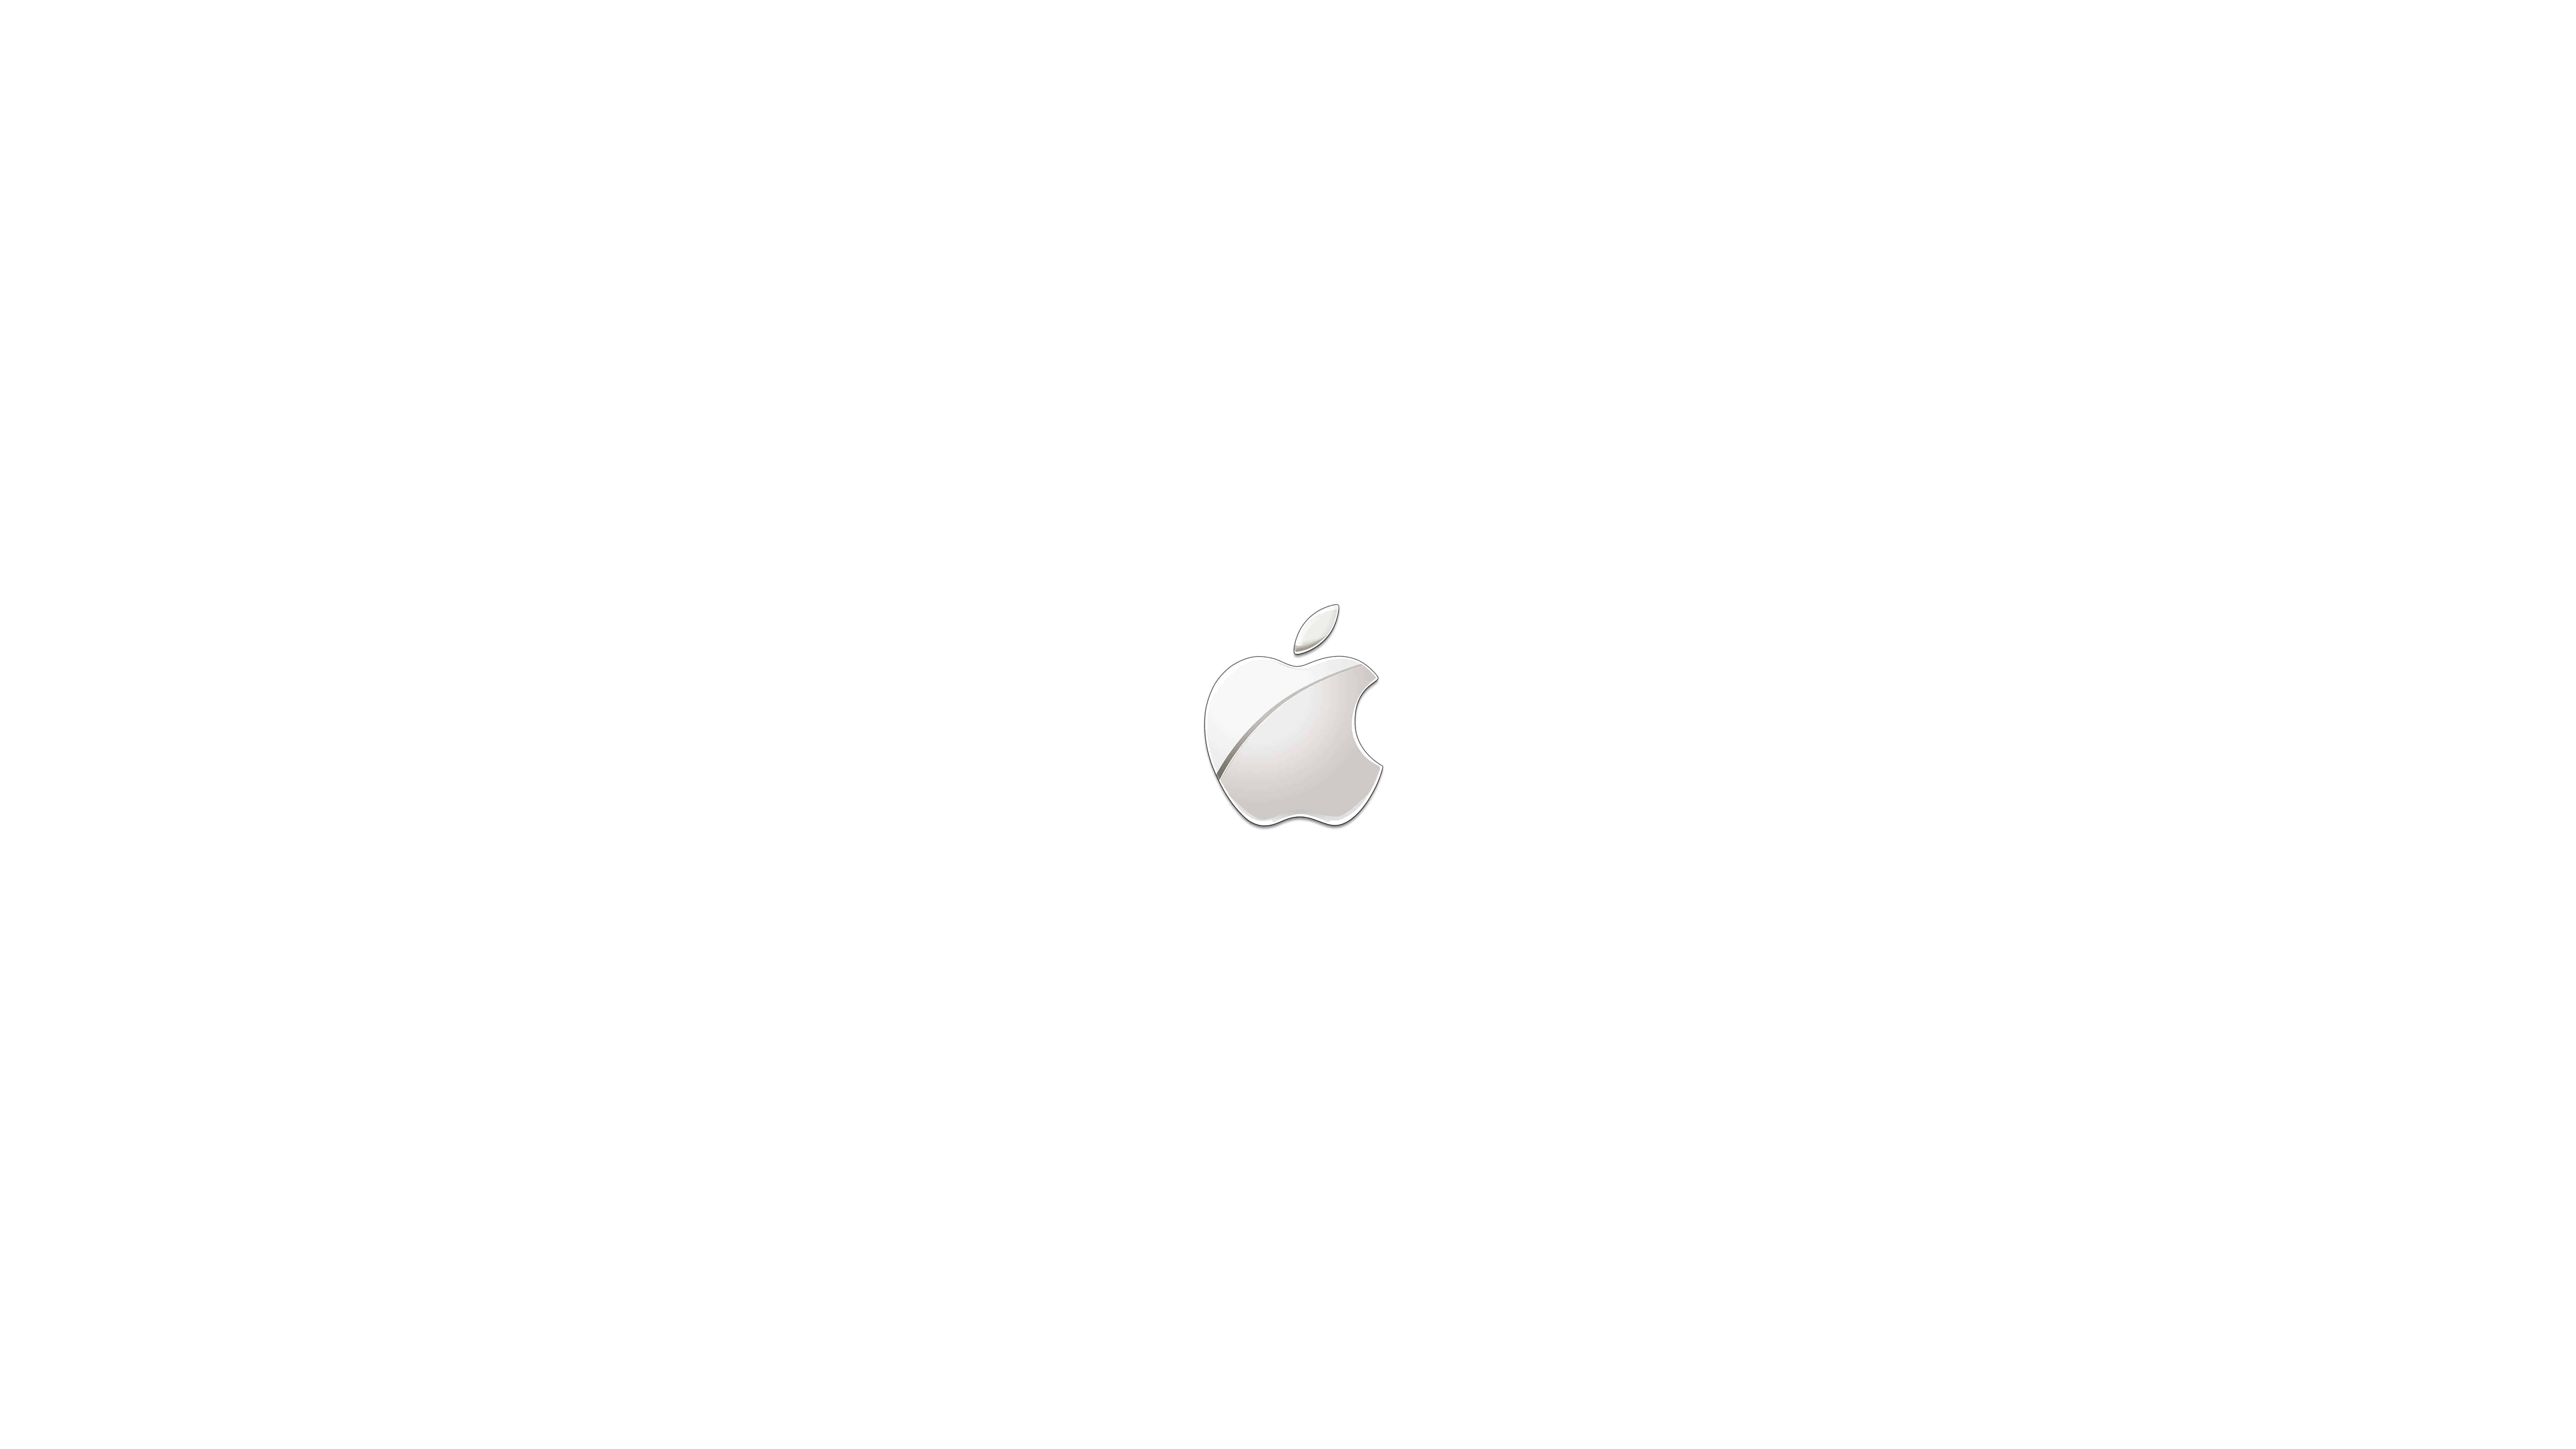 apple logo silver uhd 8k wallpaper